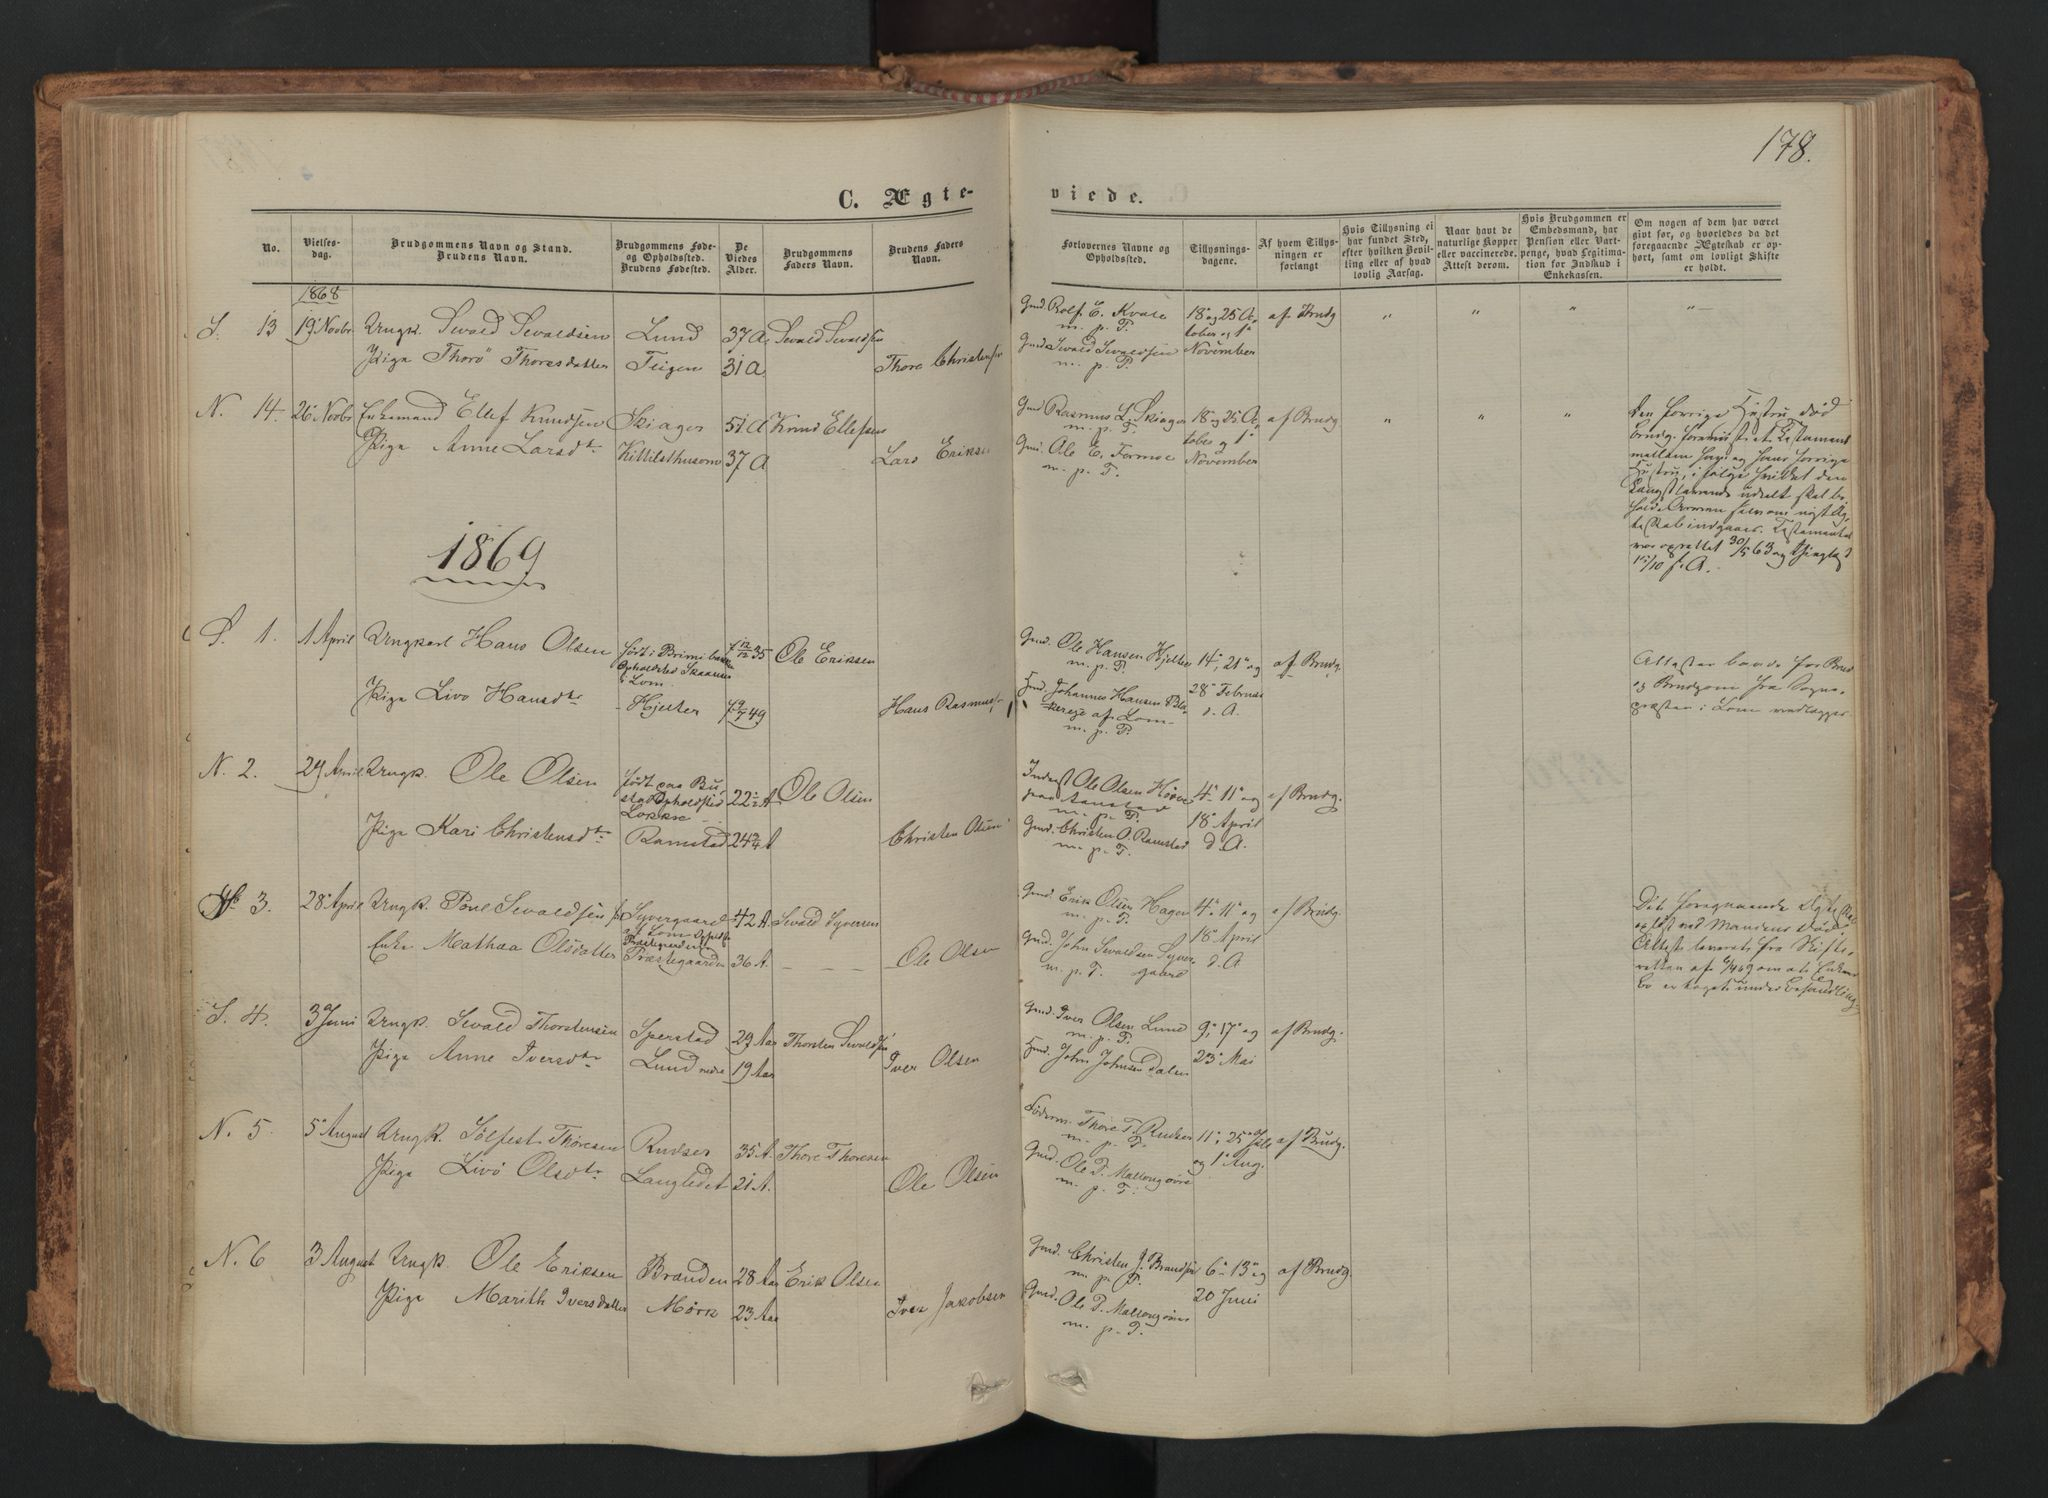 SAH, Skjåk prestekontor, Ministerialbok nr. 1, 1863-1879, s. 178